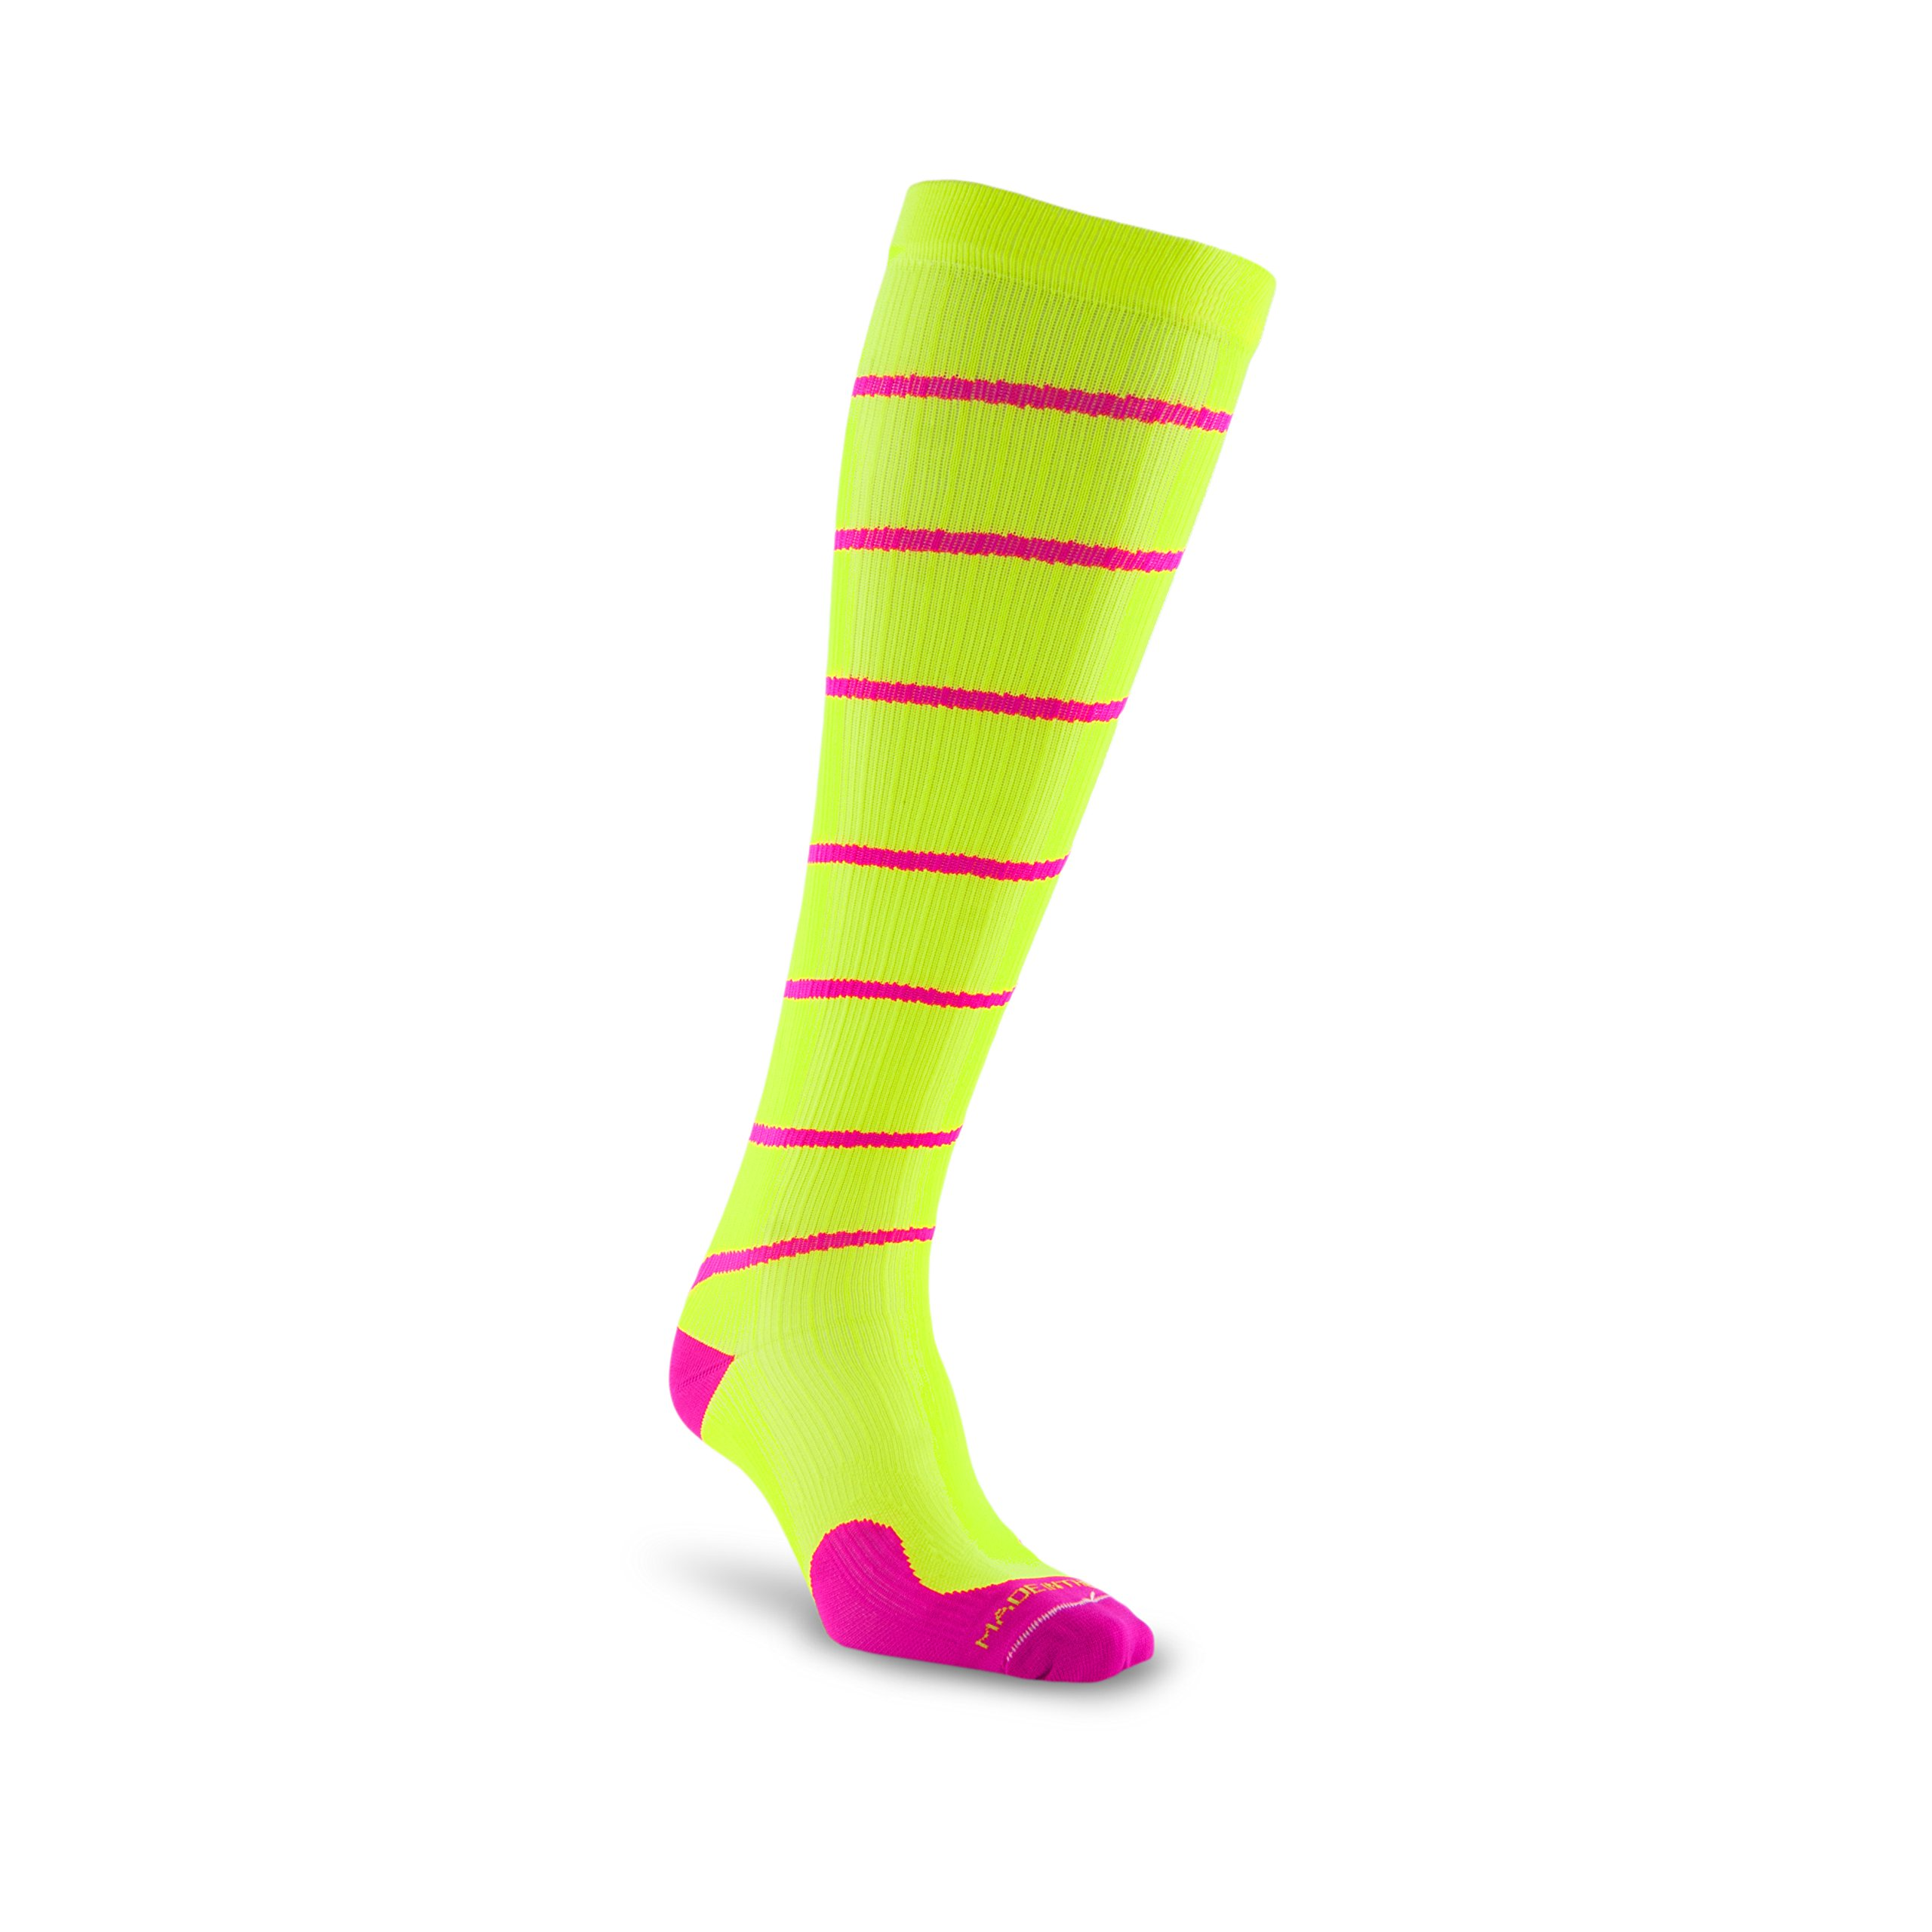 PRO Compression: Marathon (Full-Length, Over-the-Calf) Compression Socks, Neon Yellow Swirl, X-Small by PRO Compression